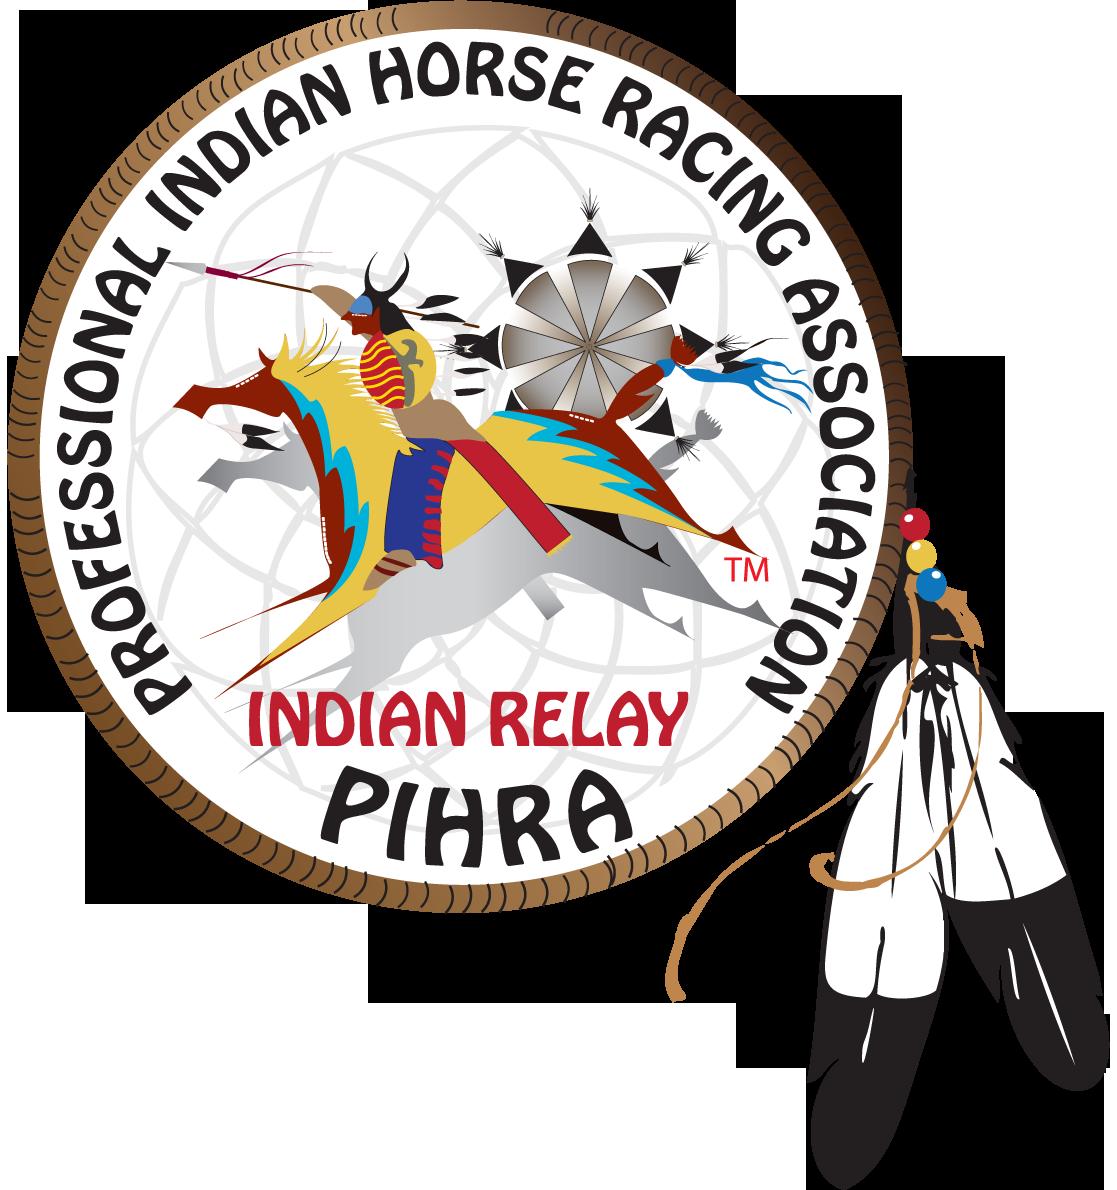 Professional Indian Horse Racing Association | Adventure Media